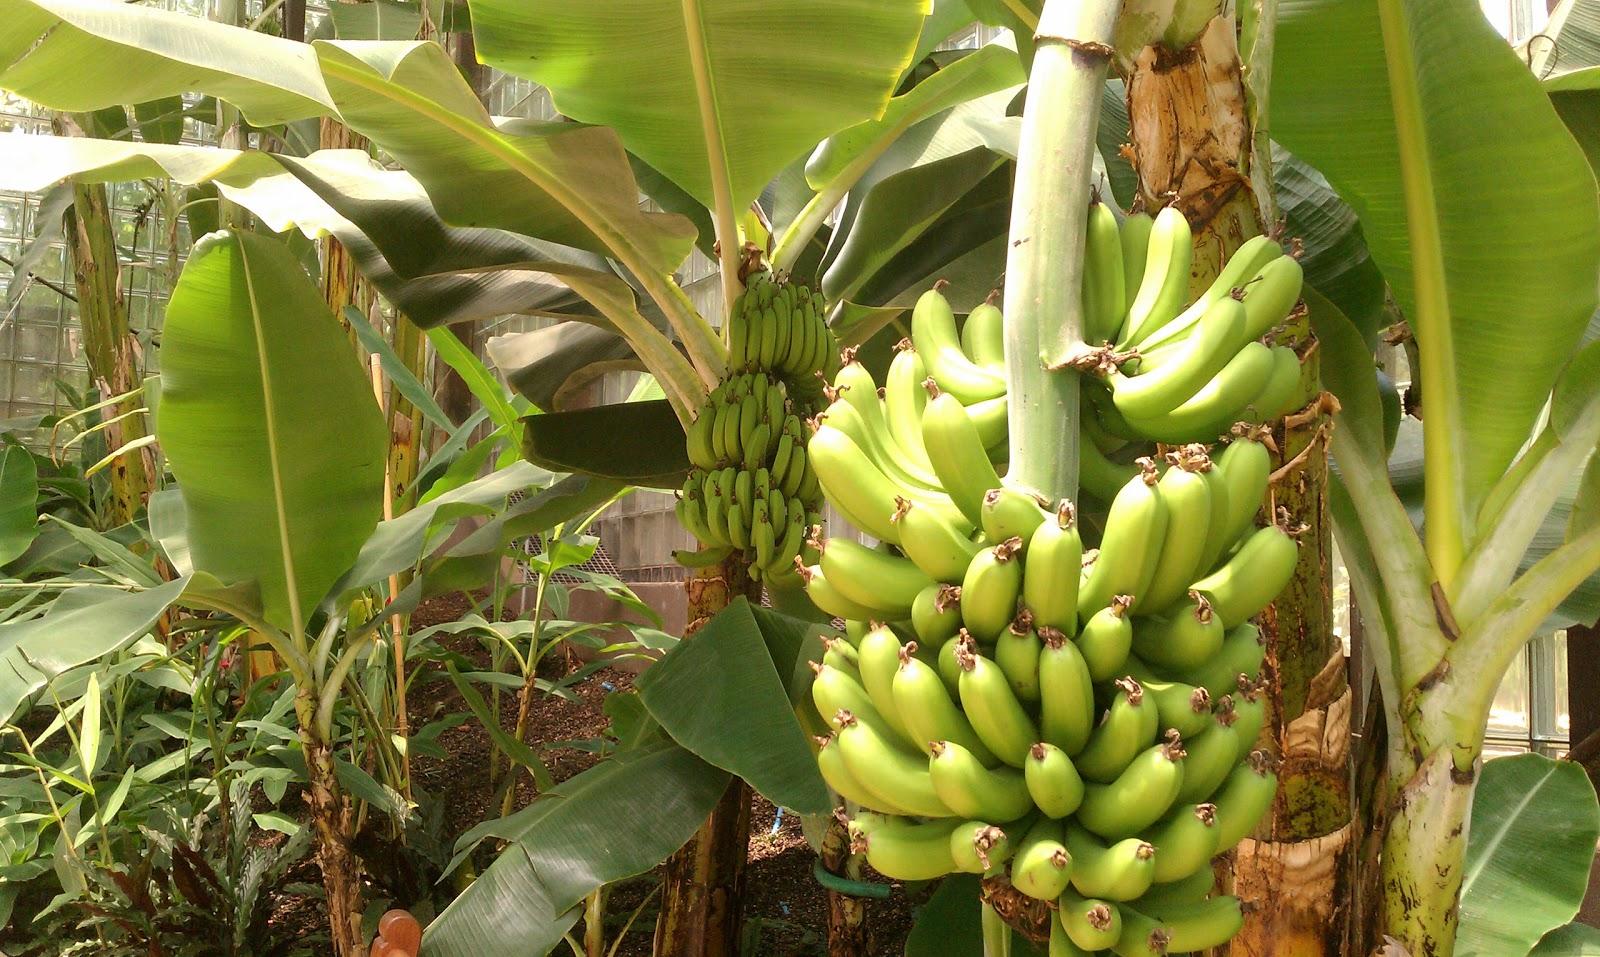 Banana plant images